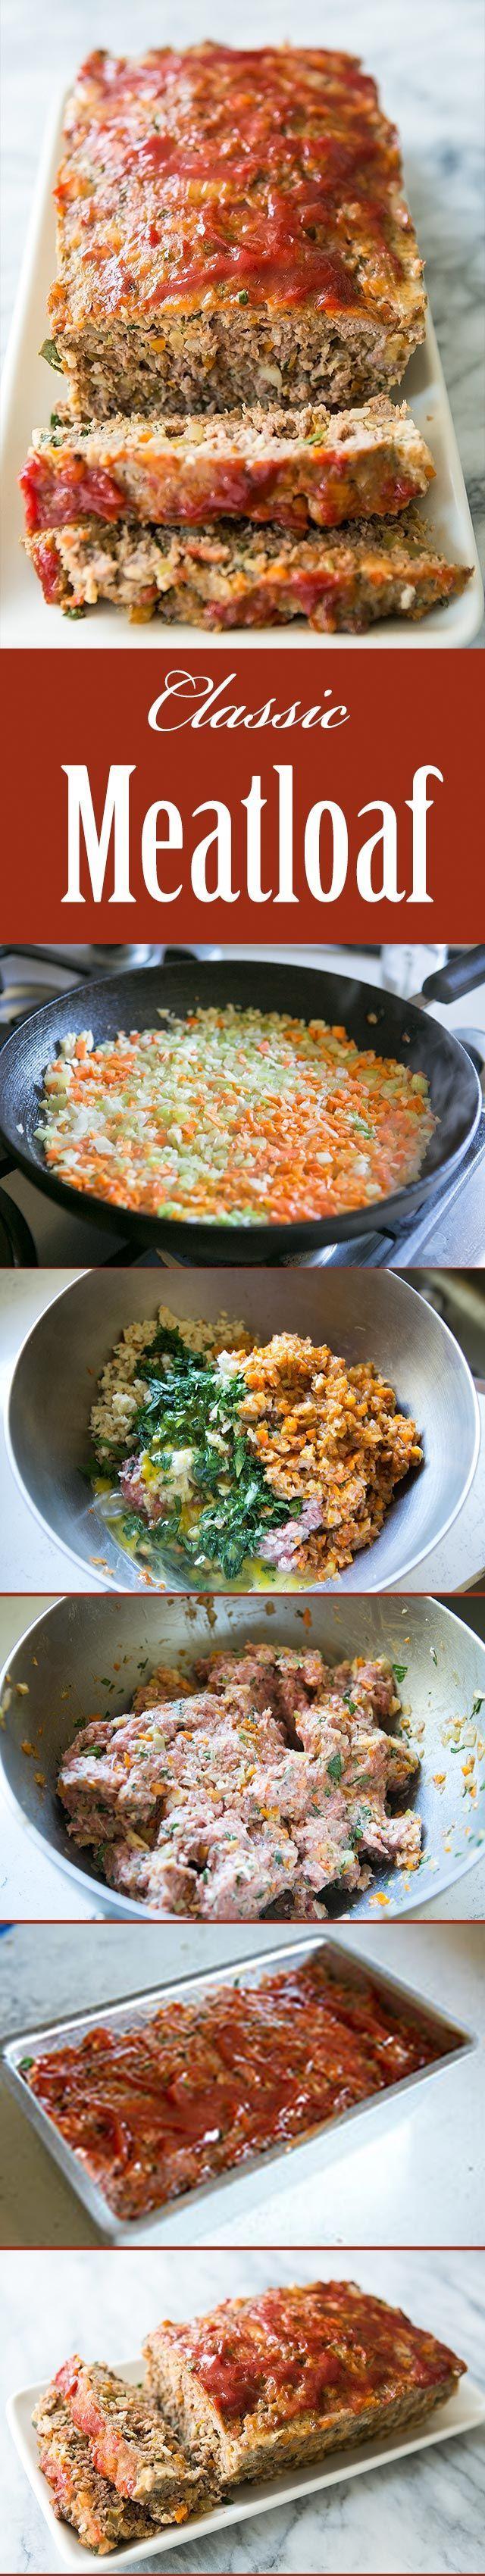 Classic Meatloaf Best Ever Recipe Classic Meatloaf Recipe Recipes Food